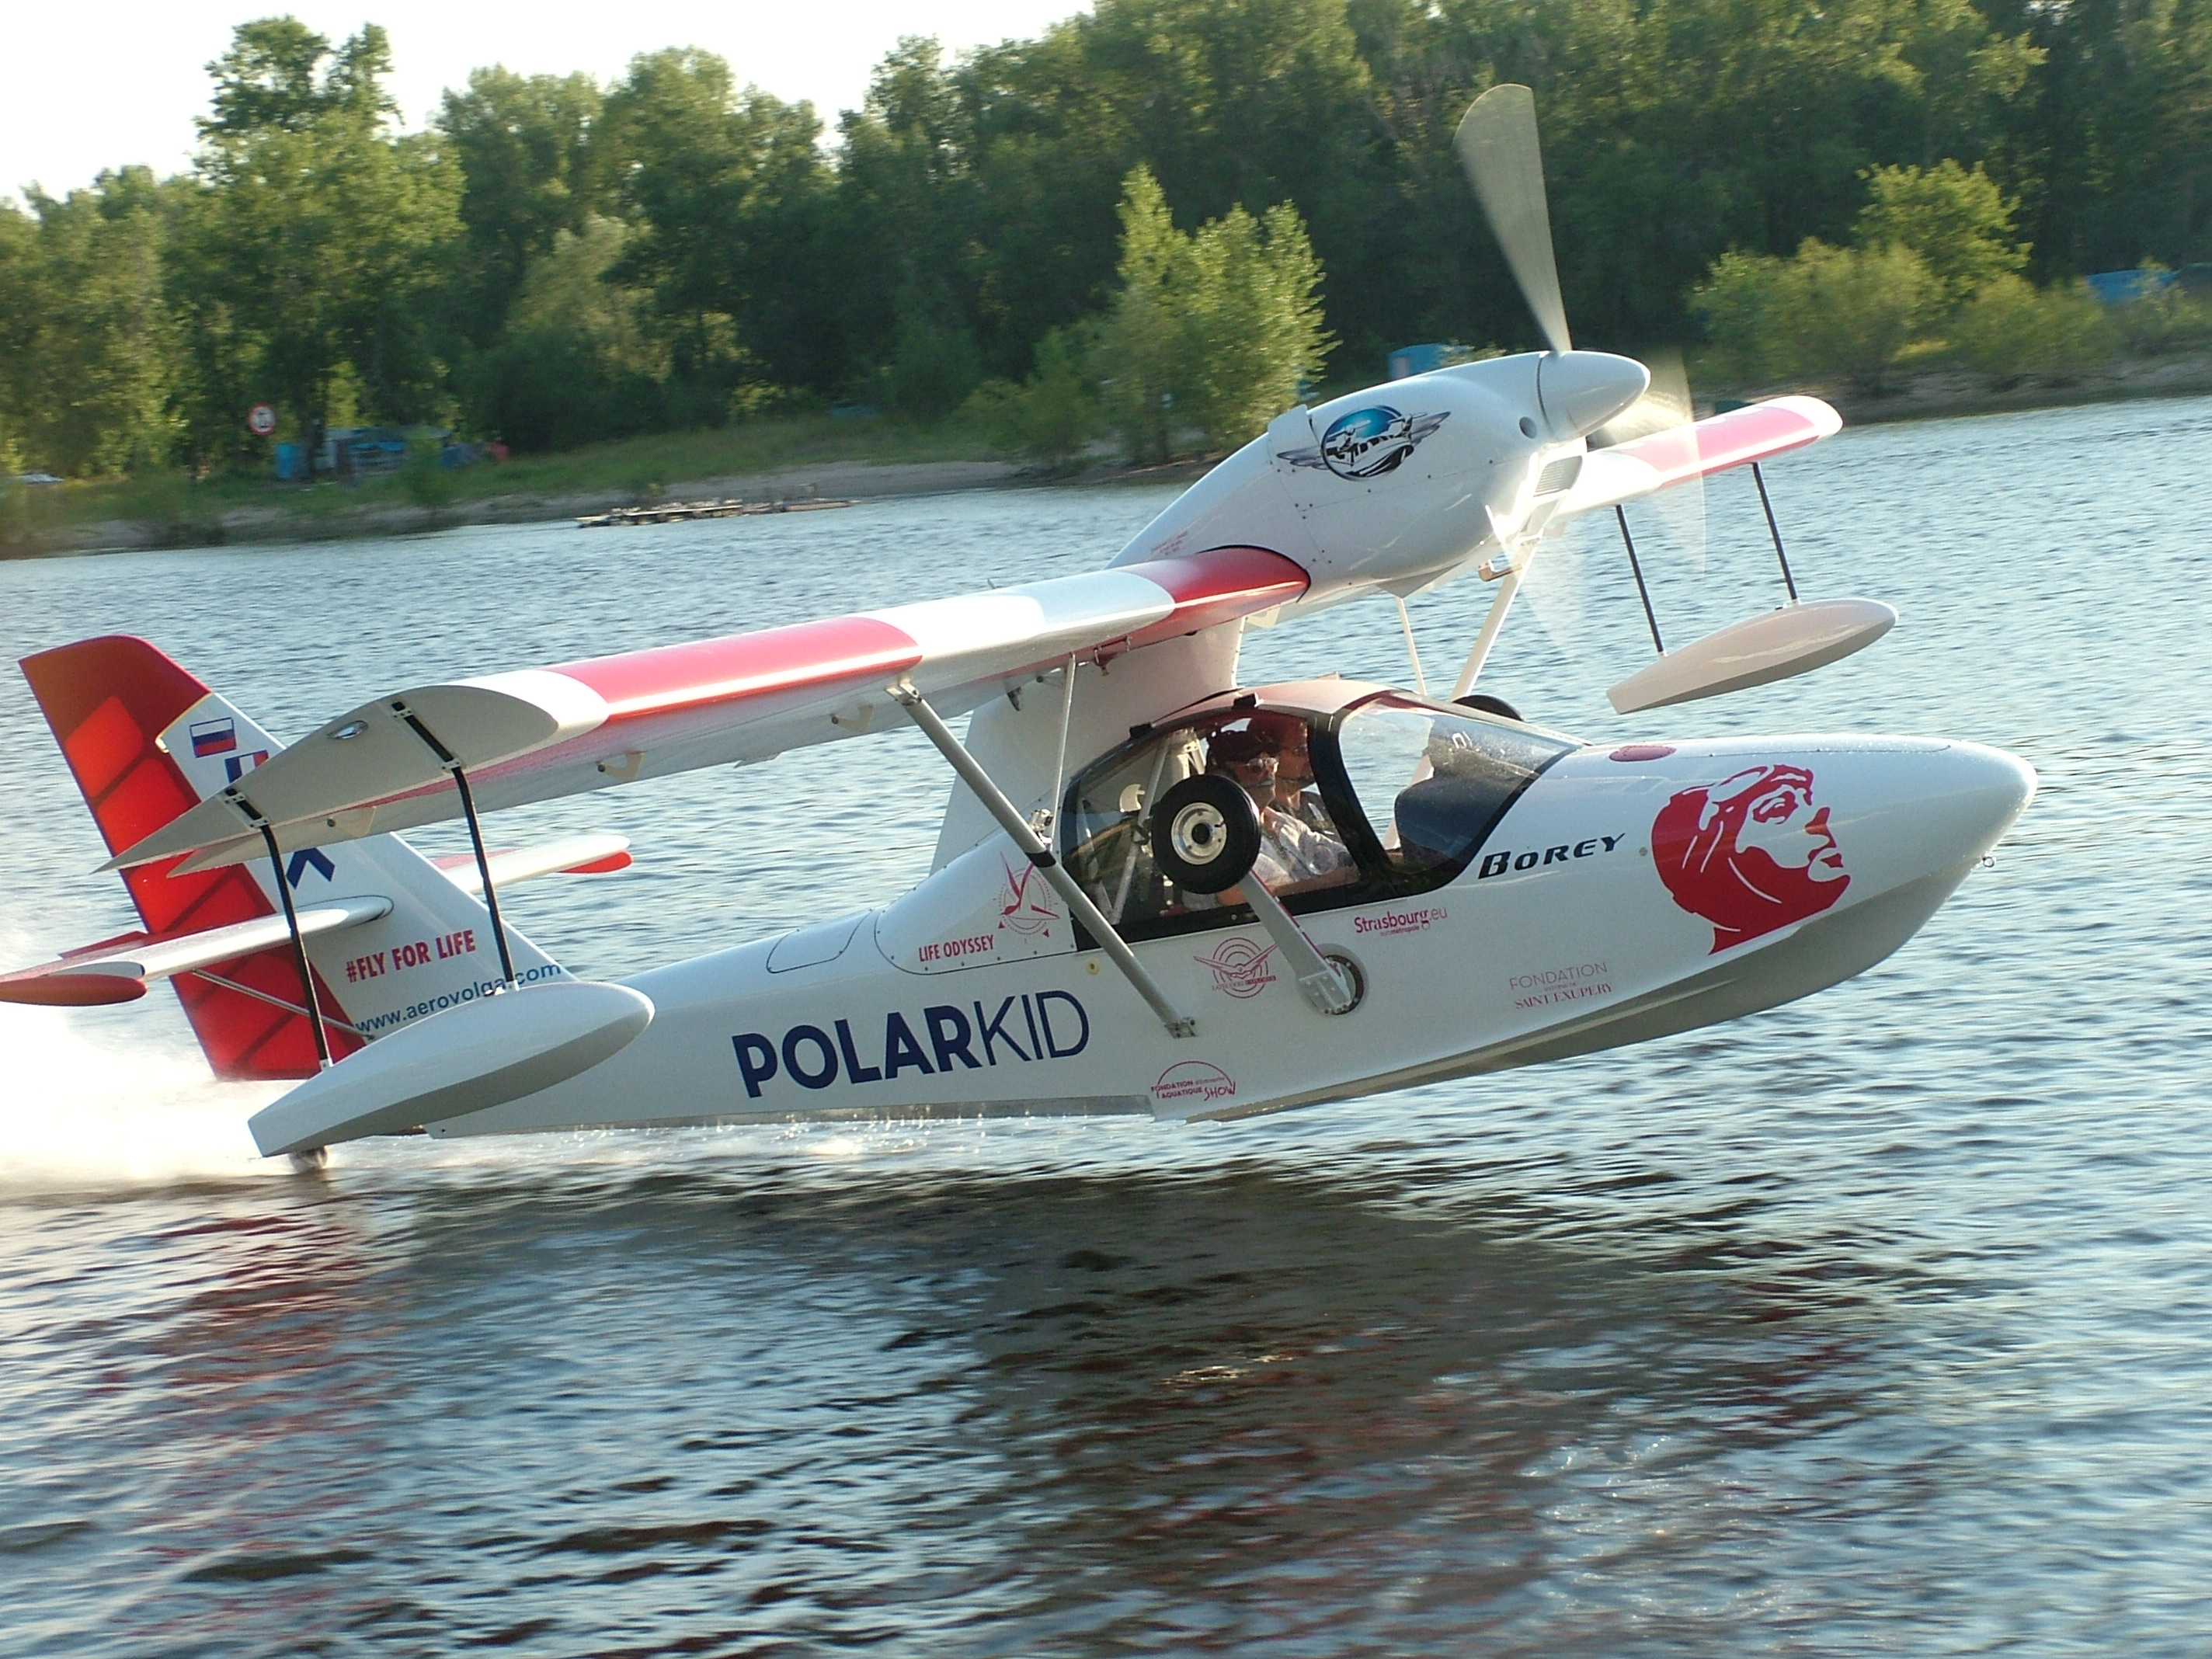 Borey UL650 | winx-adventure-aircraft-company com